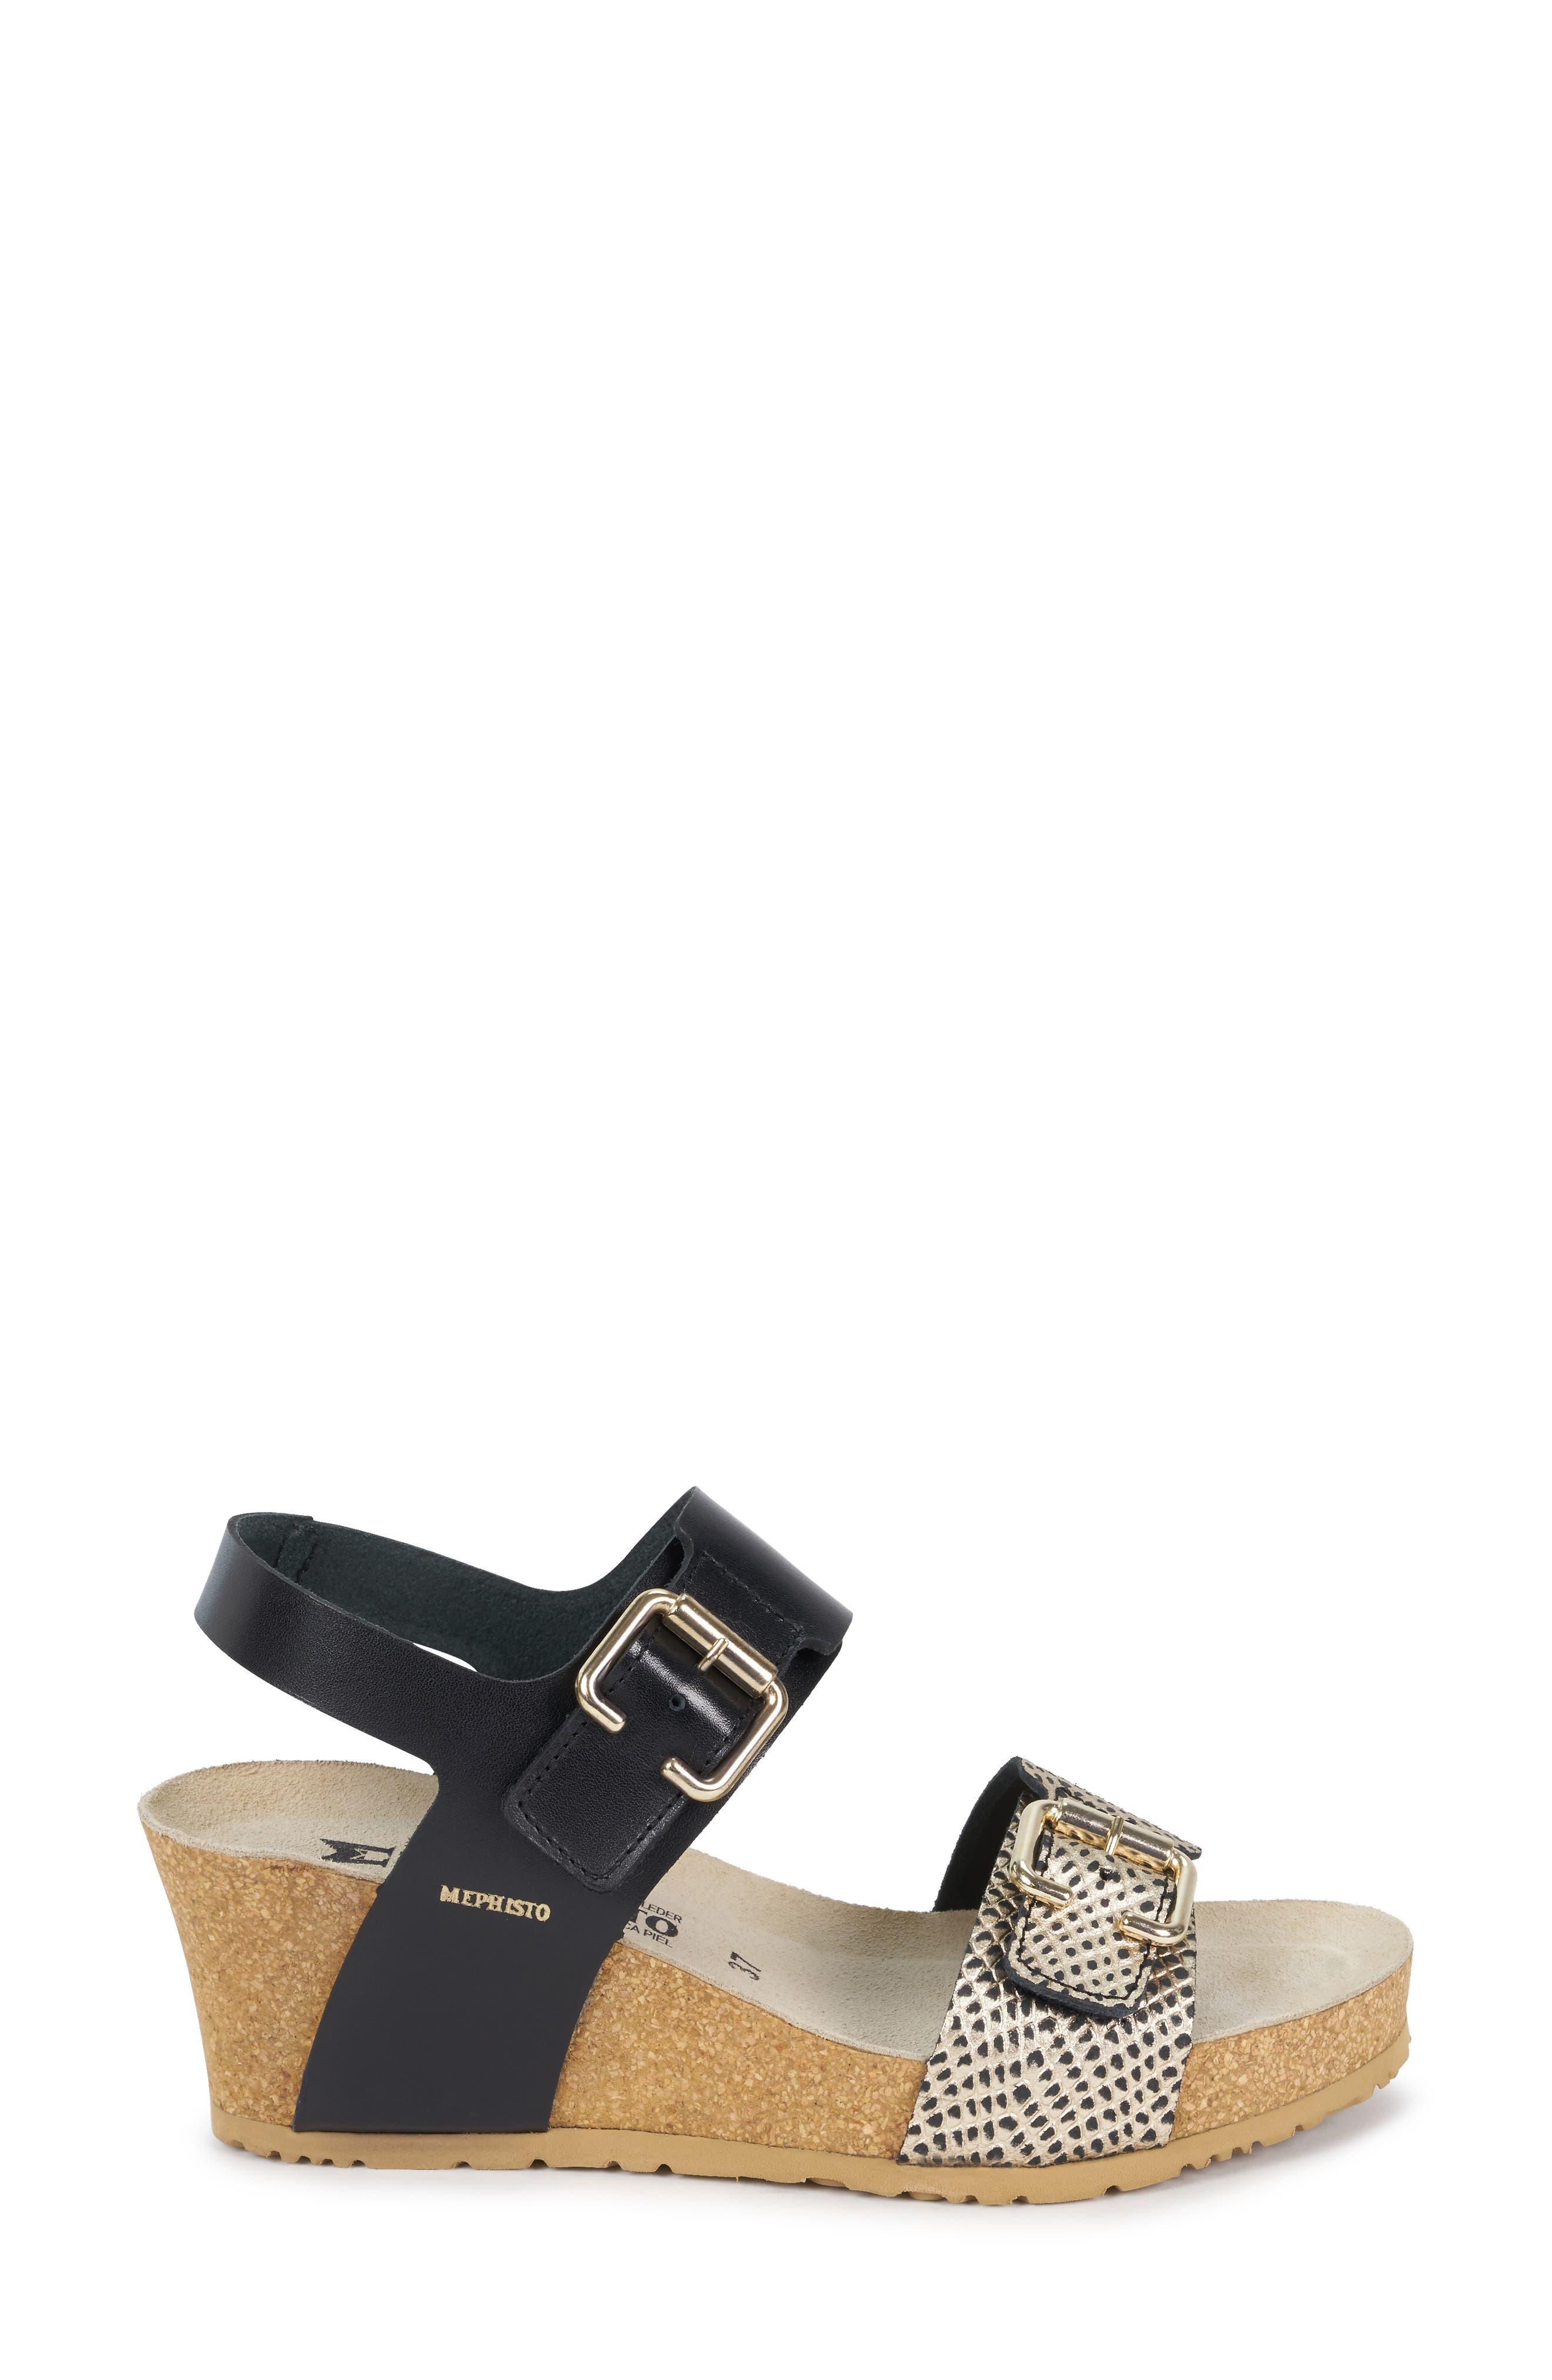 Lissandra Platform Wedge Sandal,                             Alternate thumbnail 3, color,                             BLACK/ GOLD LEATHER